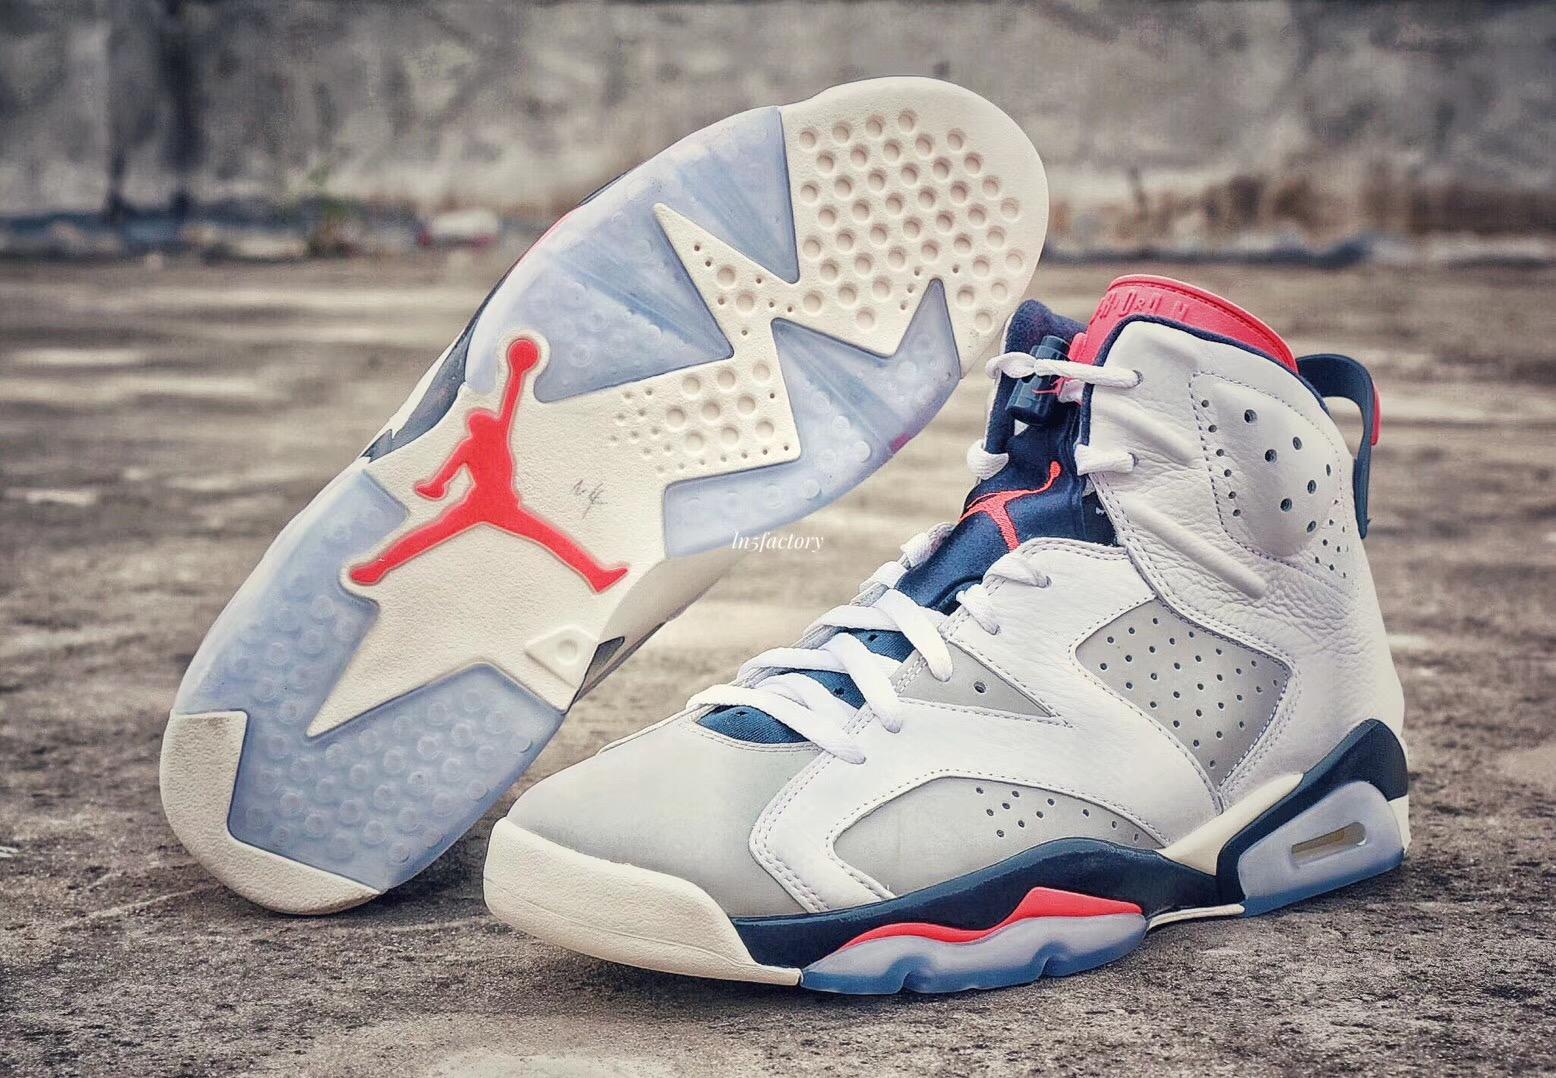 3e37f15d1be9 Air Jordan 6 Tinker 384664-104 Release Date